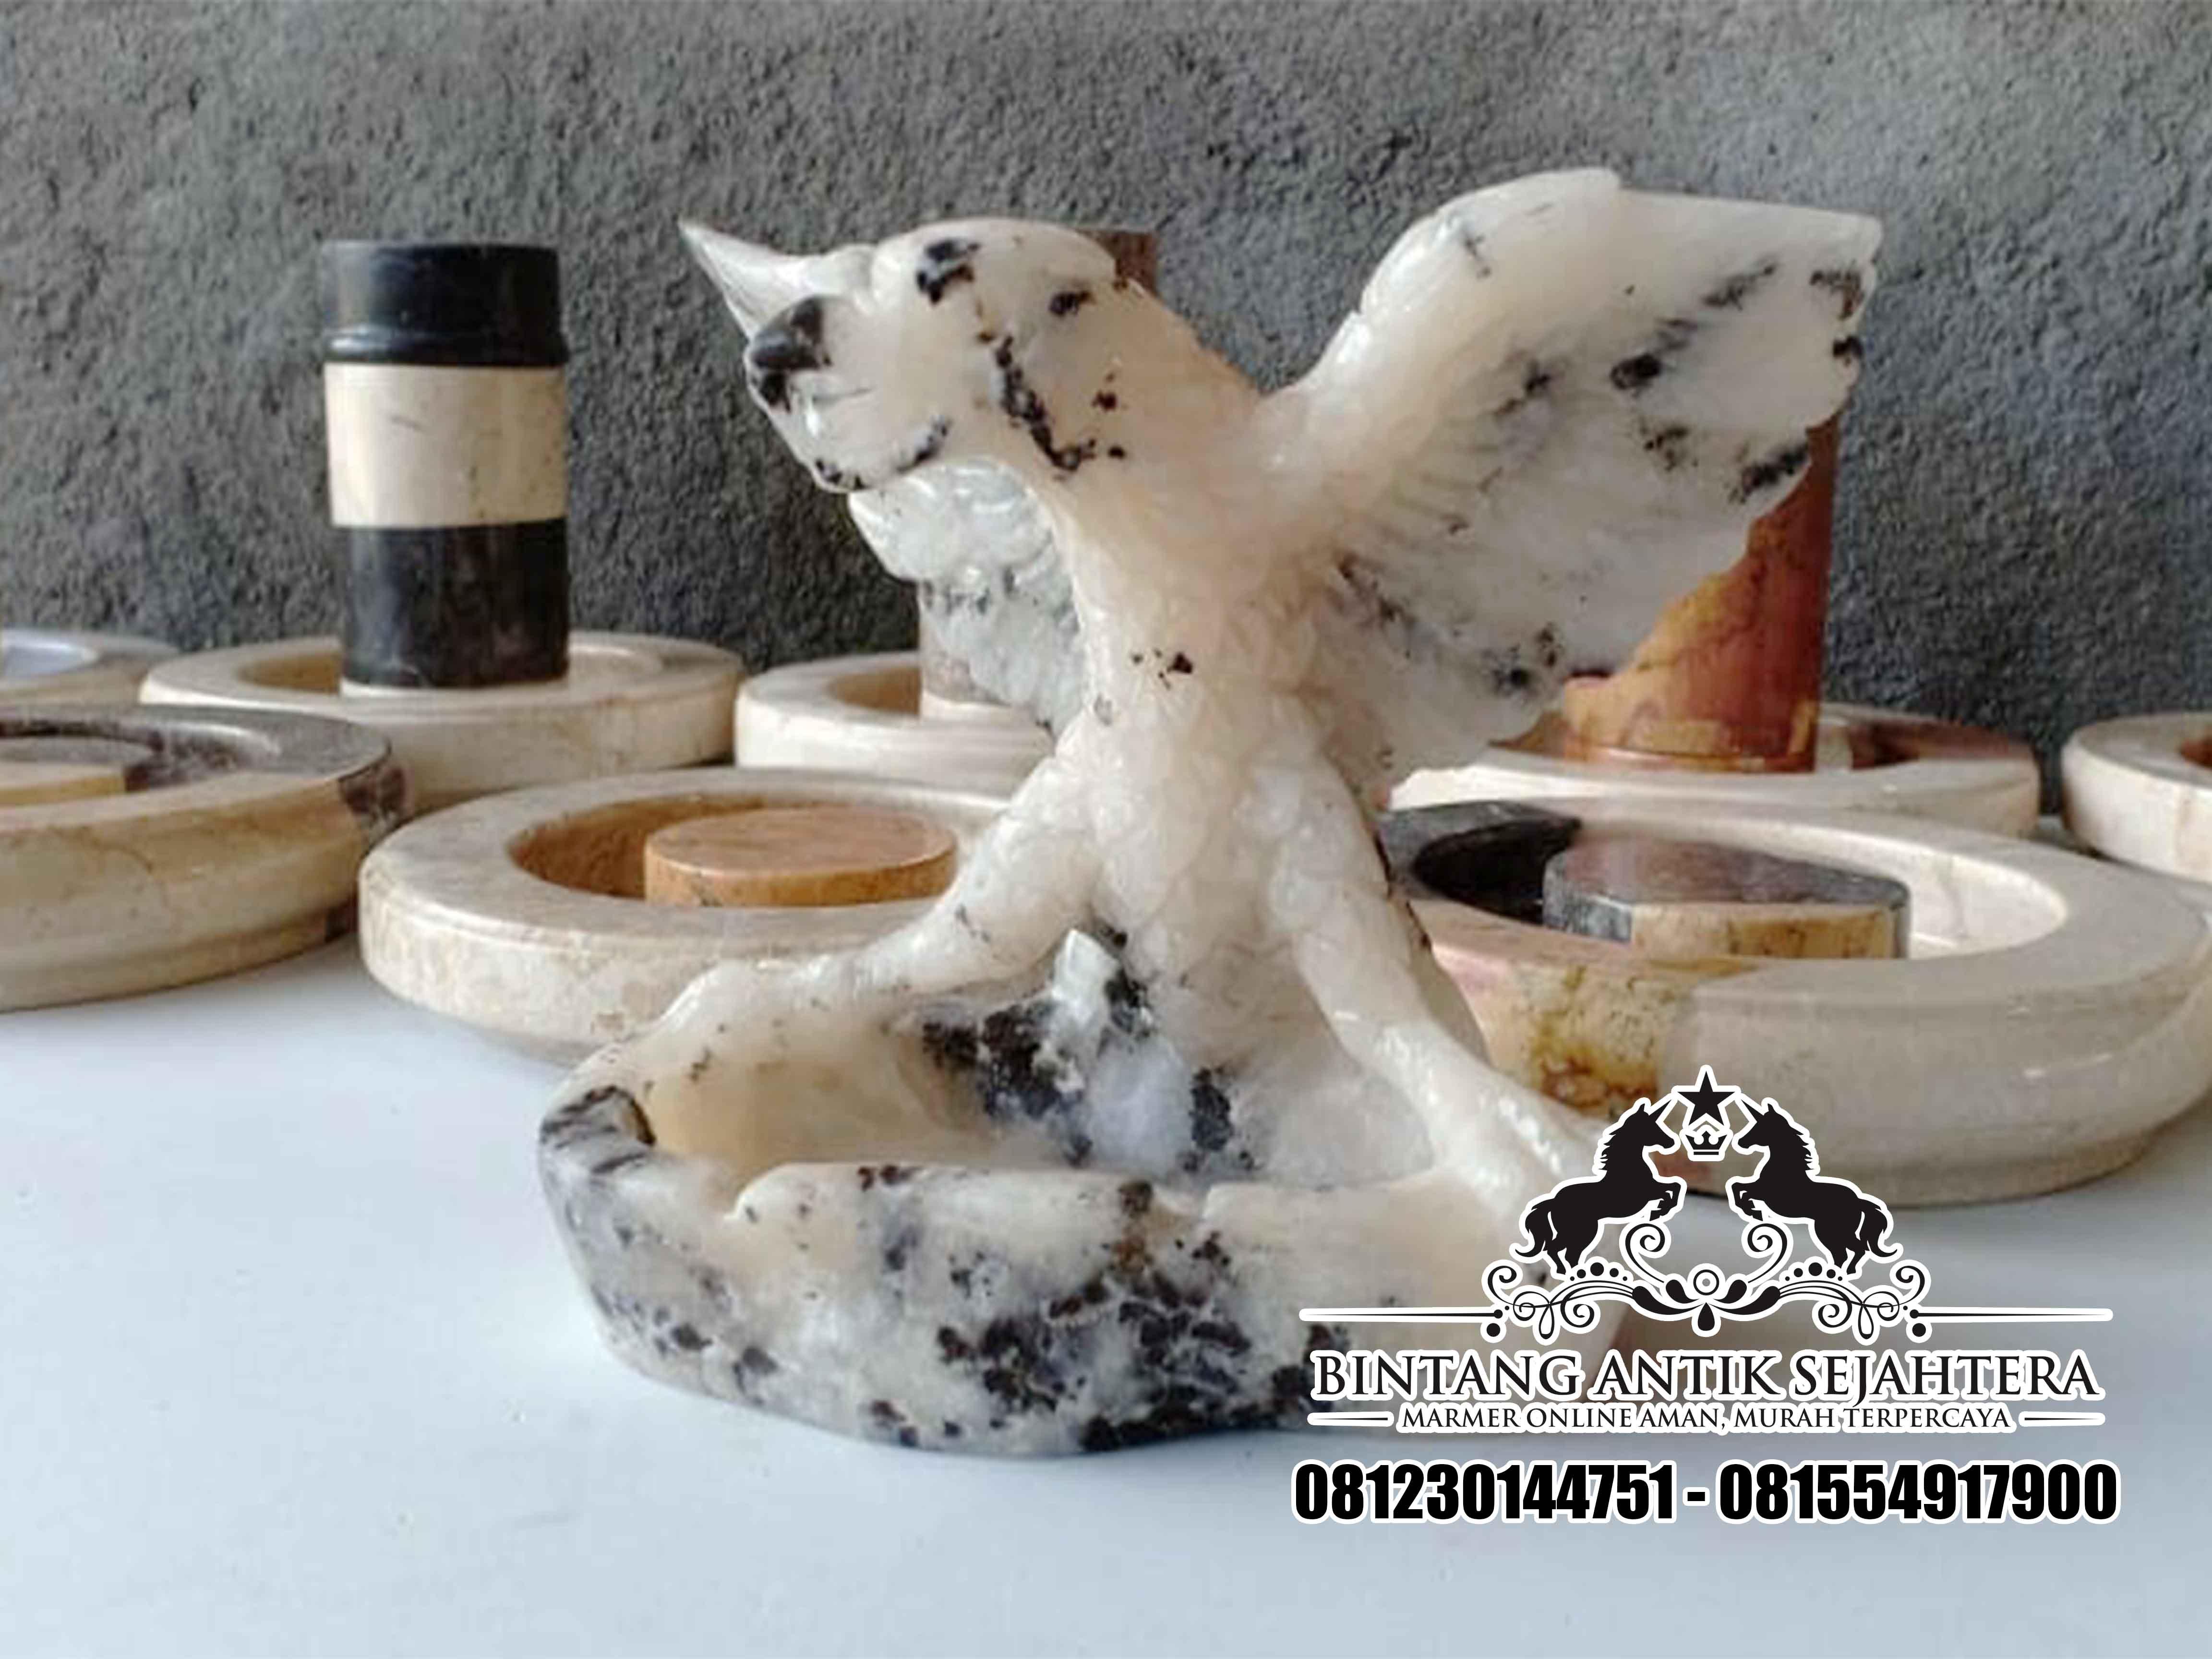 Souvenir Asbak Marmer | Asbak Unik Marmer | Kerajinan Marmer Murah